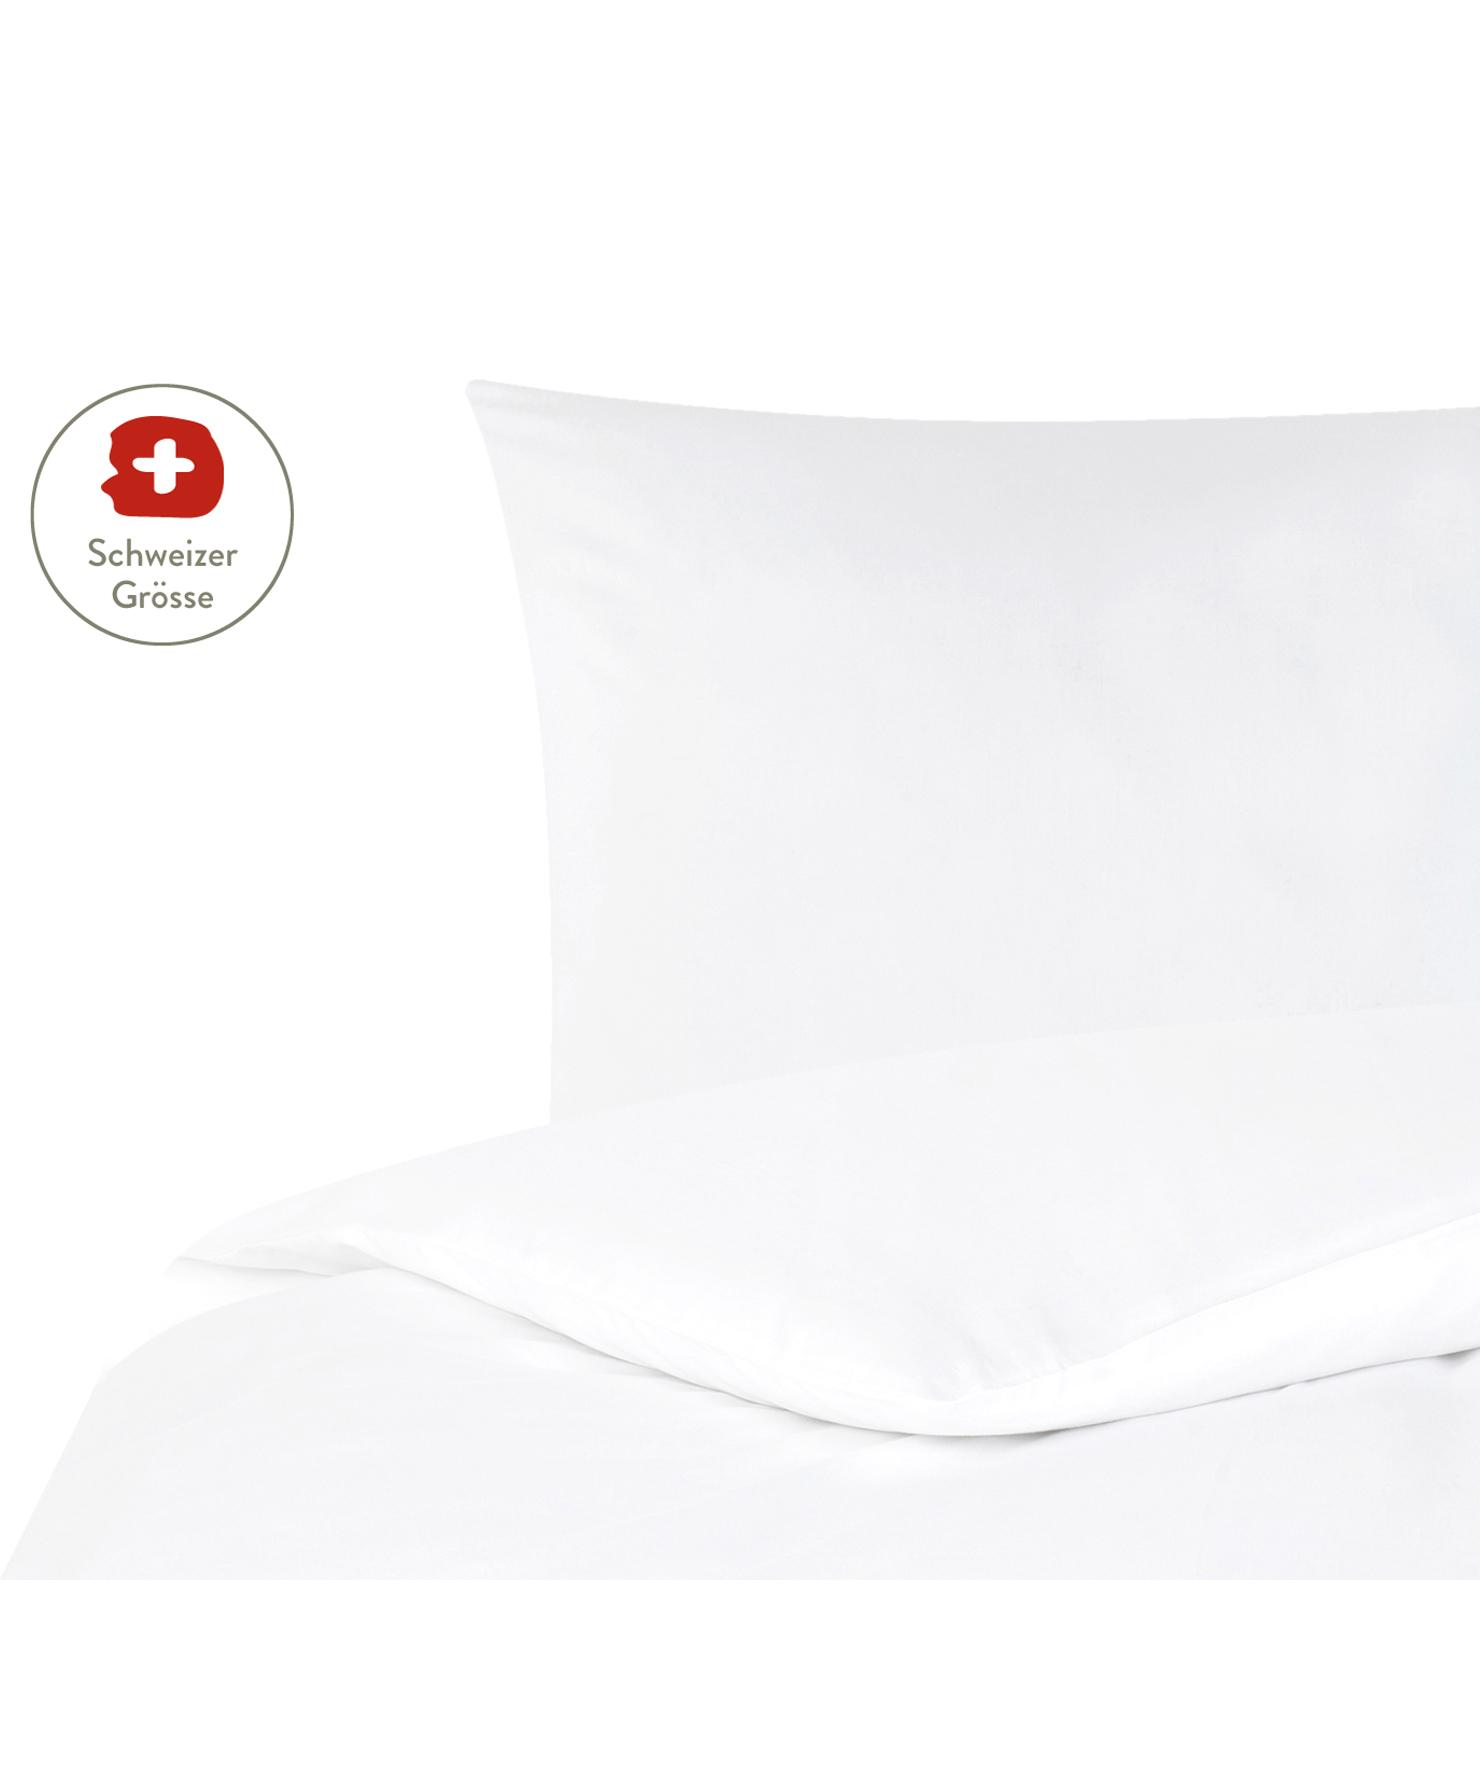 Baumwollsatin-Bettdeckenbezug Comfort in Weiss, Webart: Satin, leicht glänzend Fa, Weiss, 160 x 210 cm